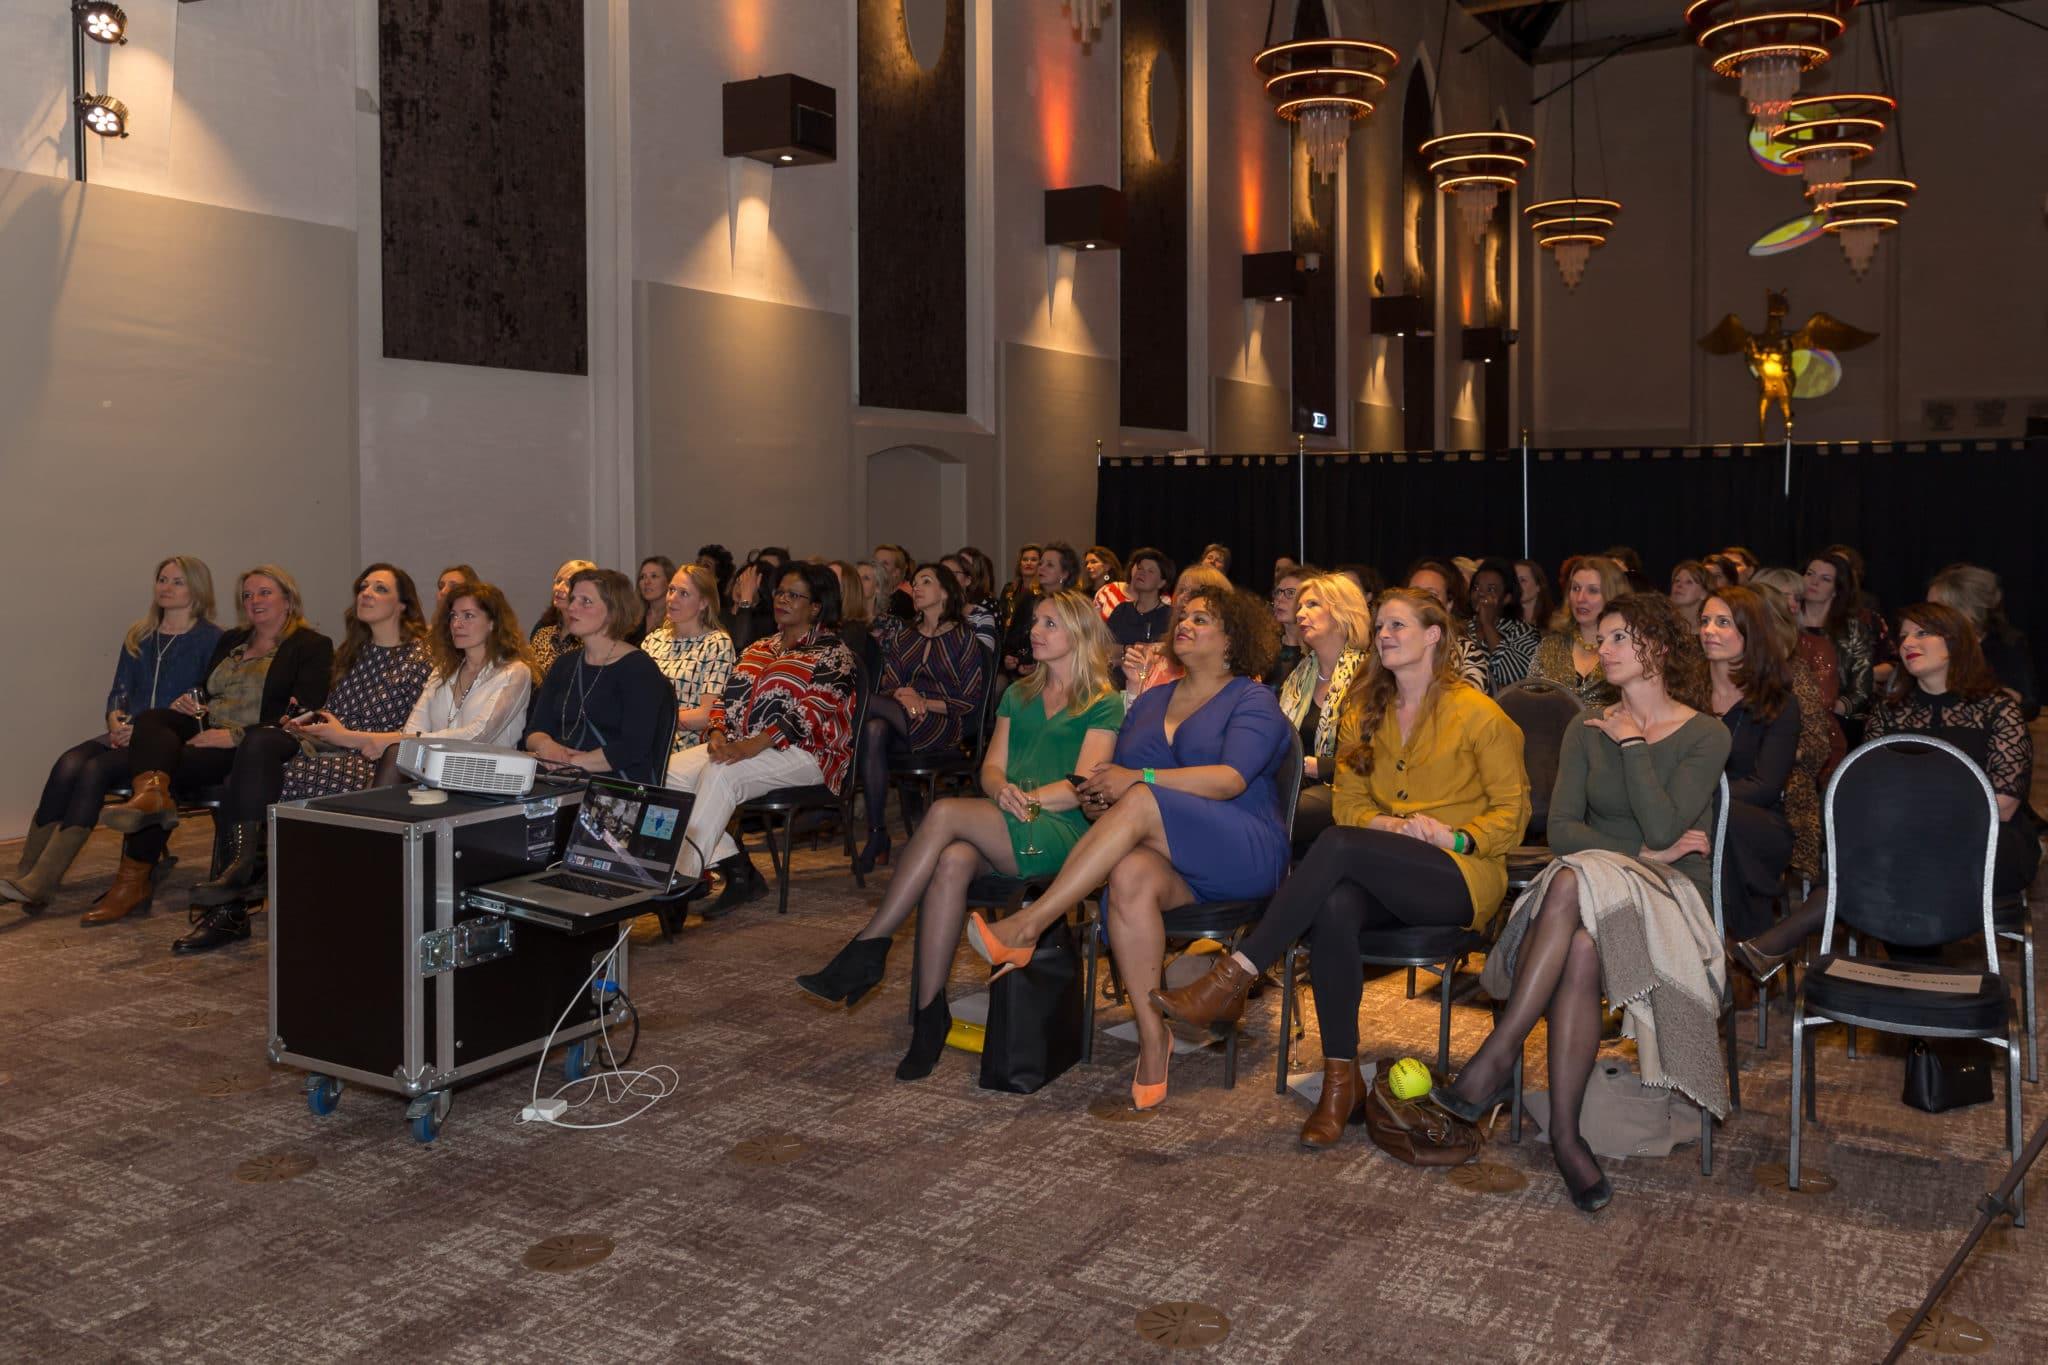 Women Celebrating Women - Manifest Your Dreamlife